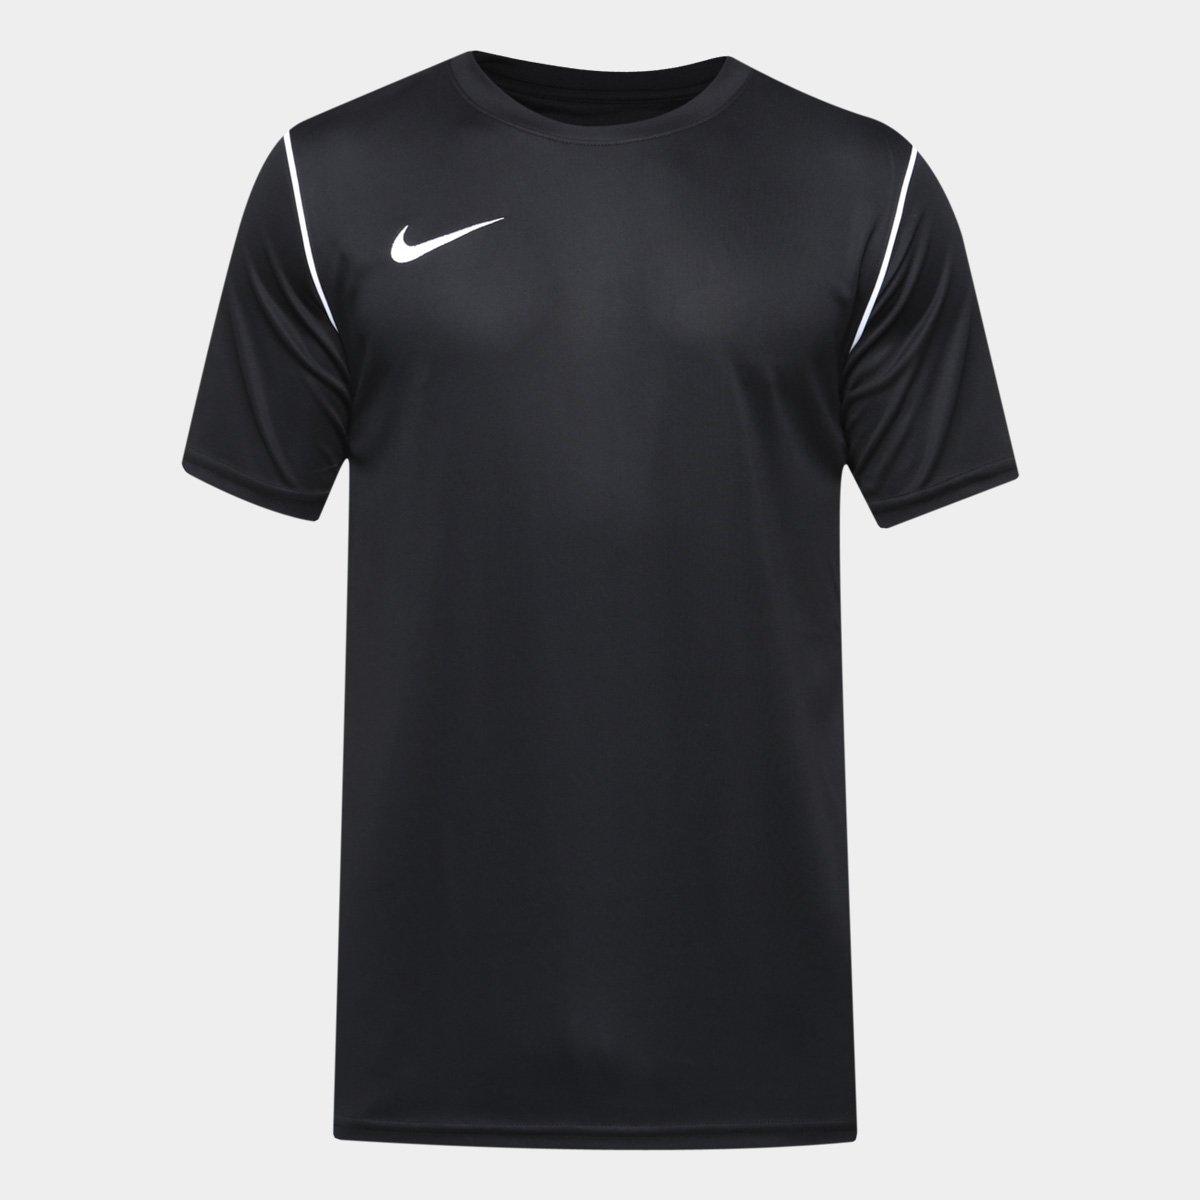 Camisa Nike Dry-Fit Black